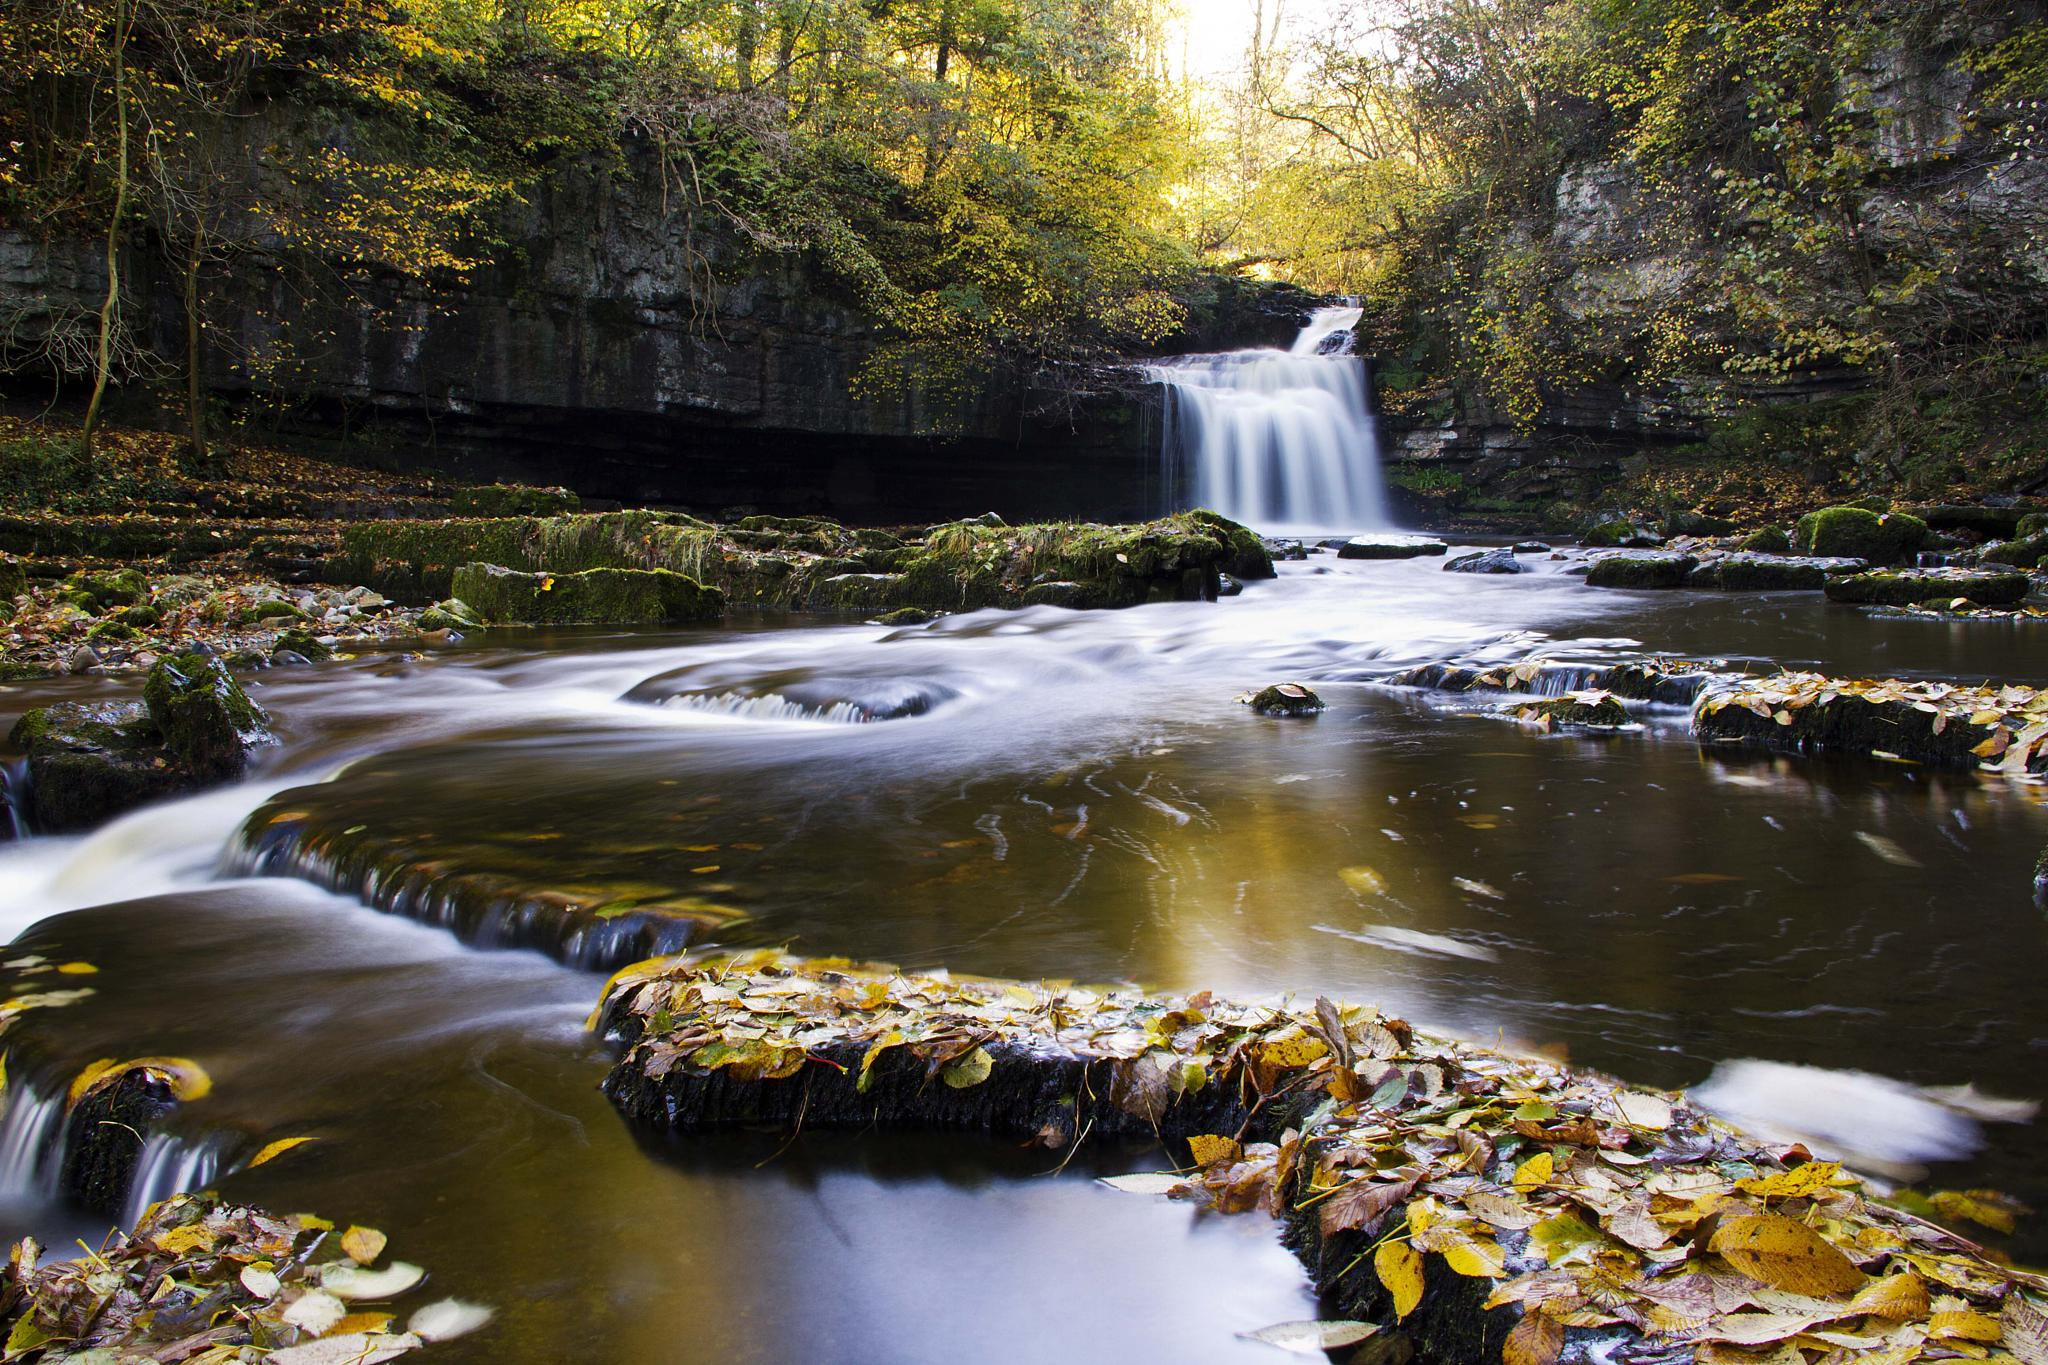 Cauldron Falls by Ken Blackburn Digital Imaging